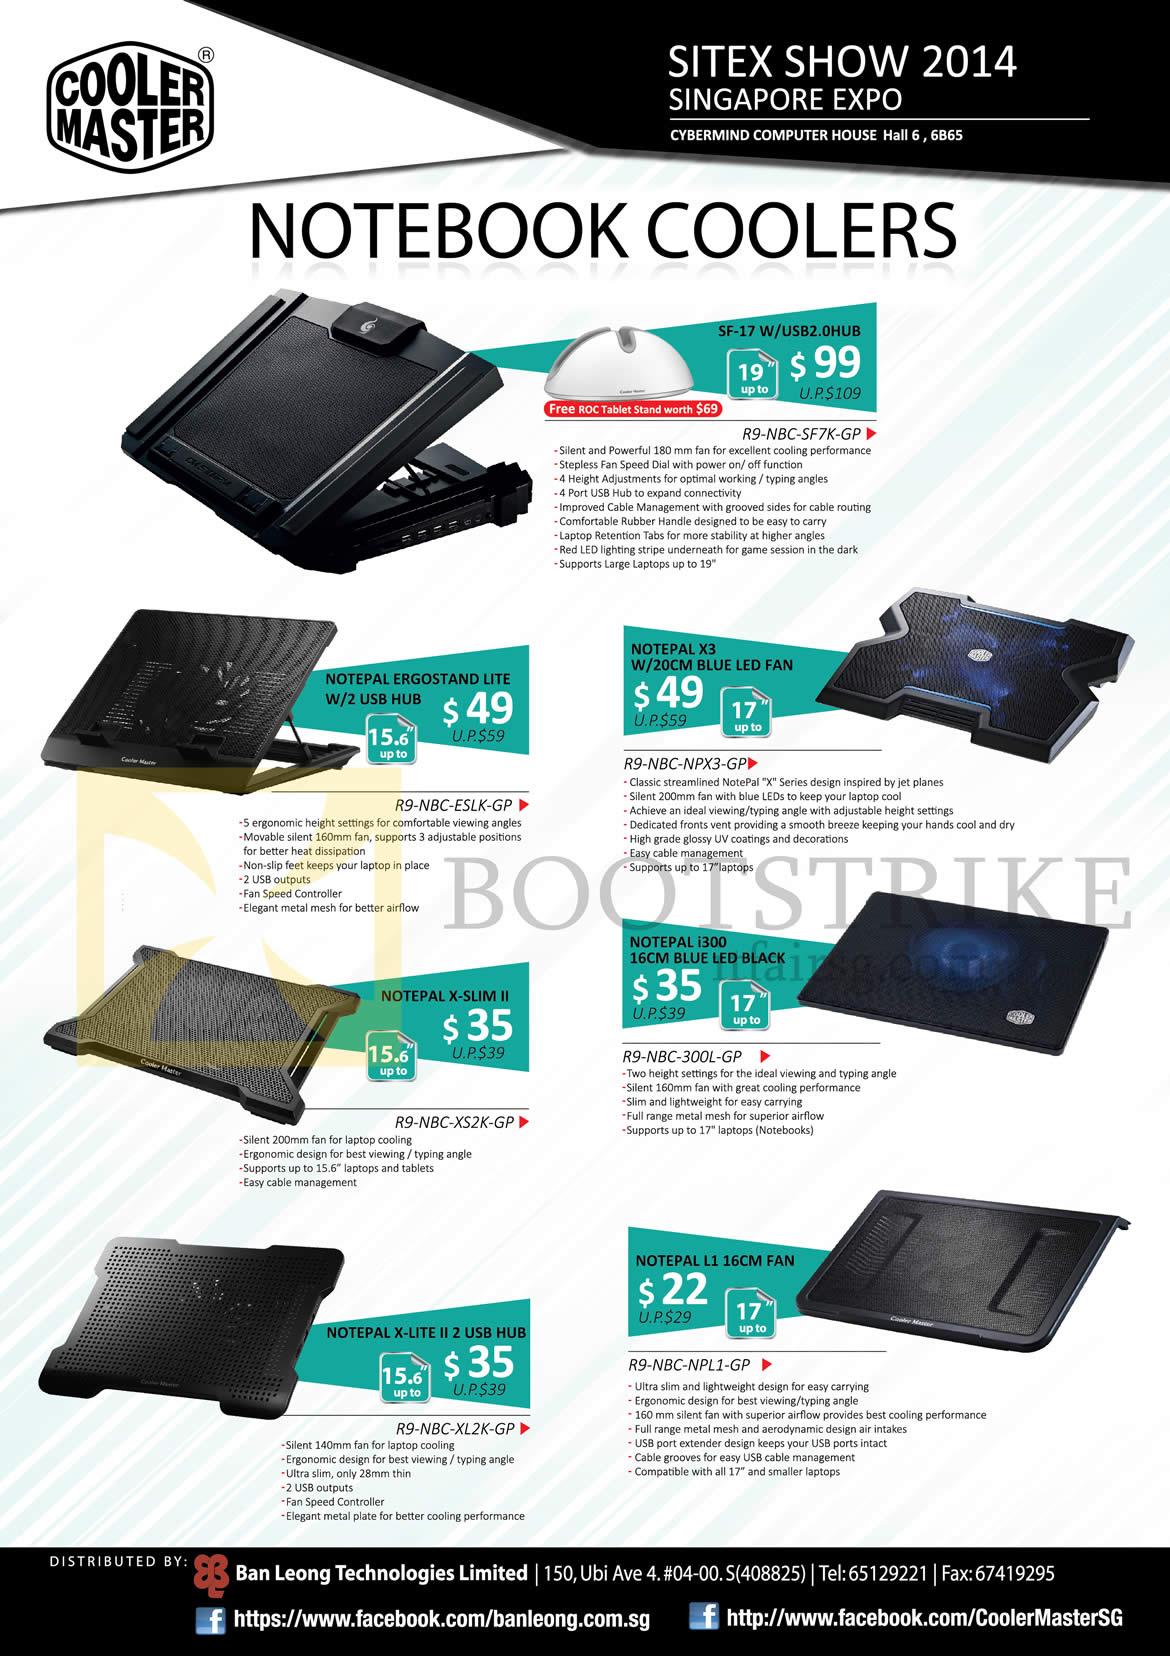 SITEX 2014 price list image brochure of Cybermind Cooler Master Notebook Coolers SF-17 WUSB2.0HUB, R9-NBC-SF7K-GP, Notepal X3 W20CM Fan, Ergostand Lite W2 USB Hub, X-Slim II, I300 16CM LED